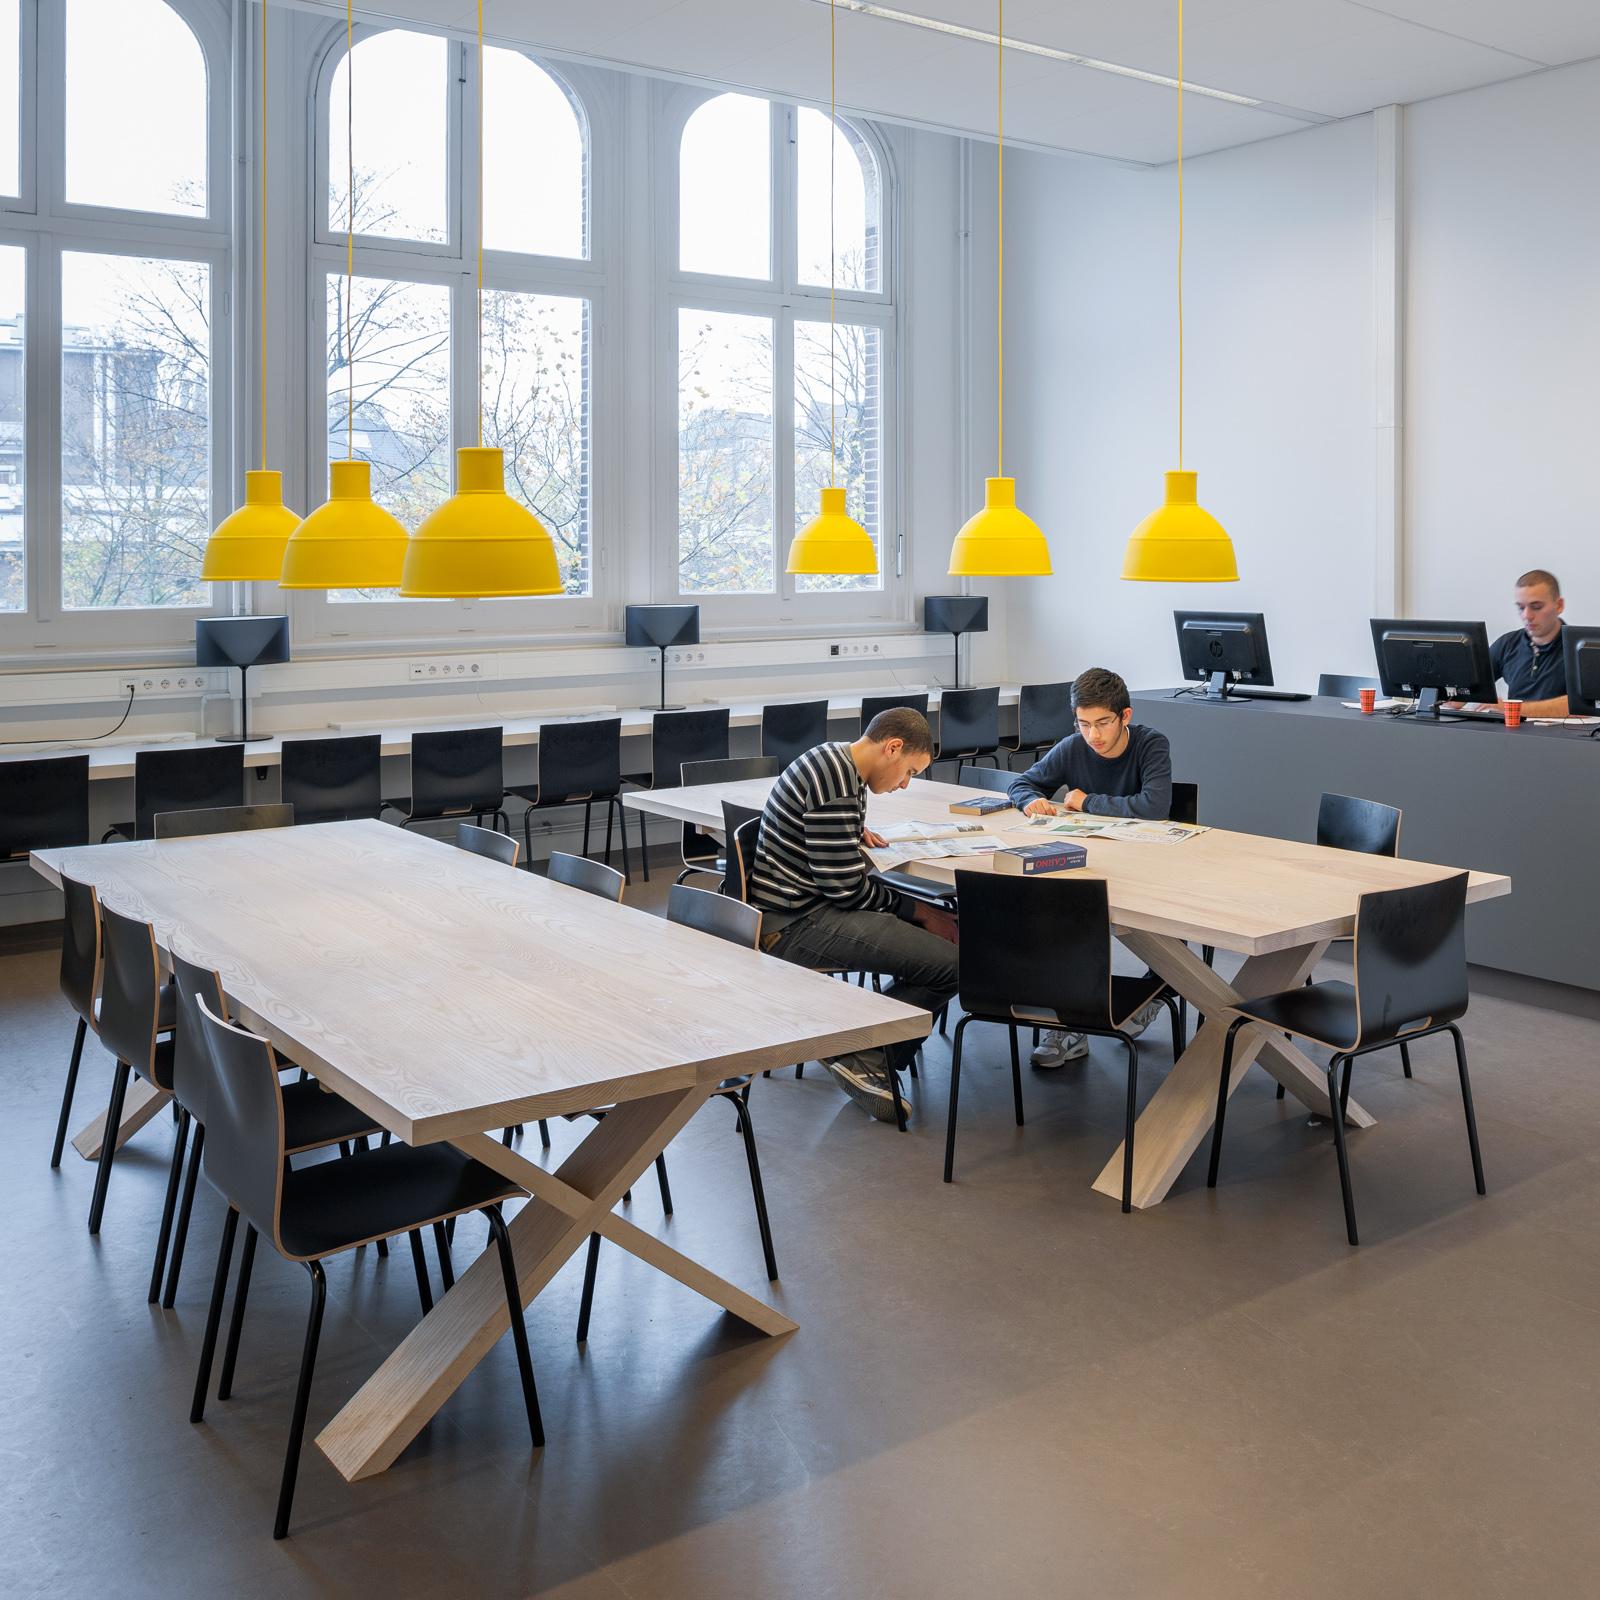 Renovatie en verbouwing cml oosterpark amsterdam for Interieur architectuur